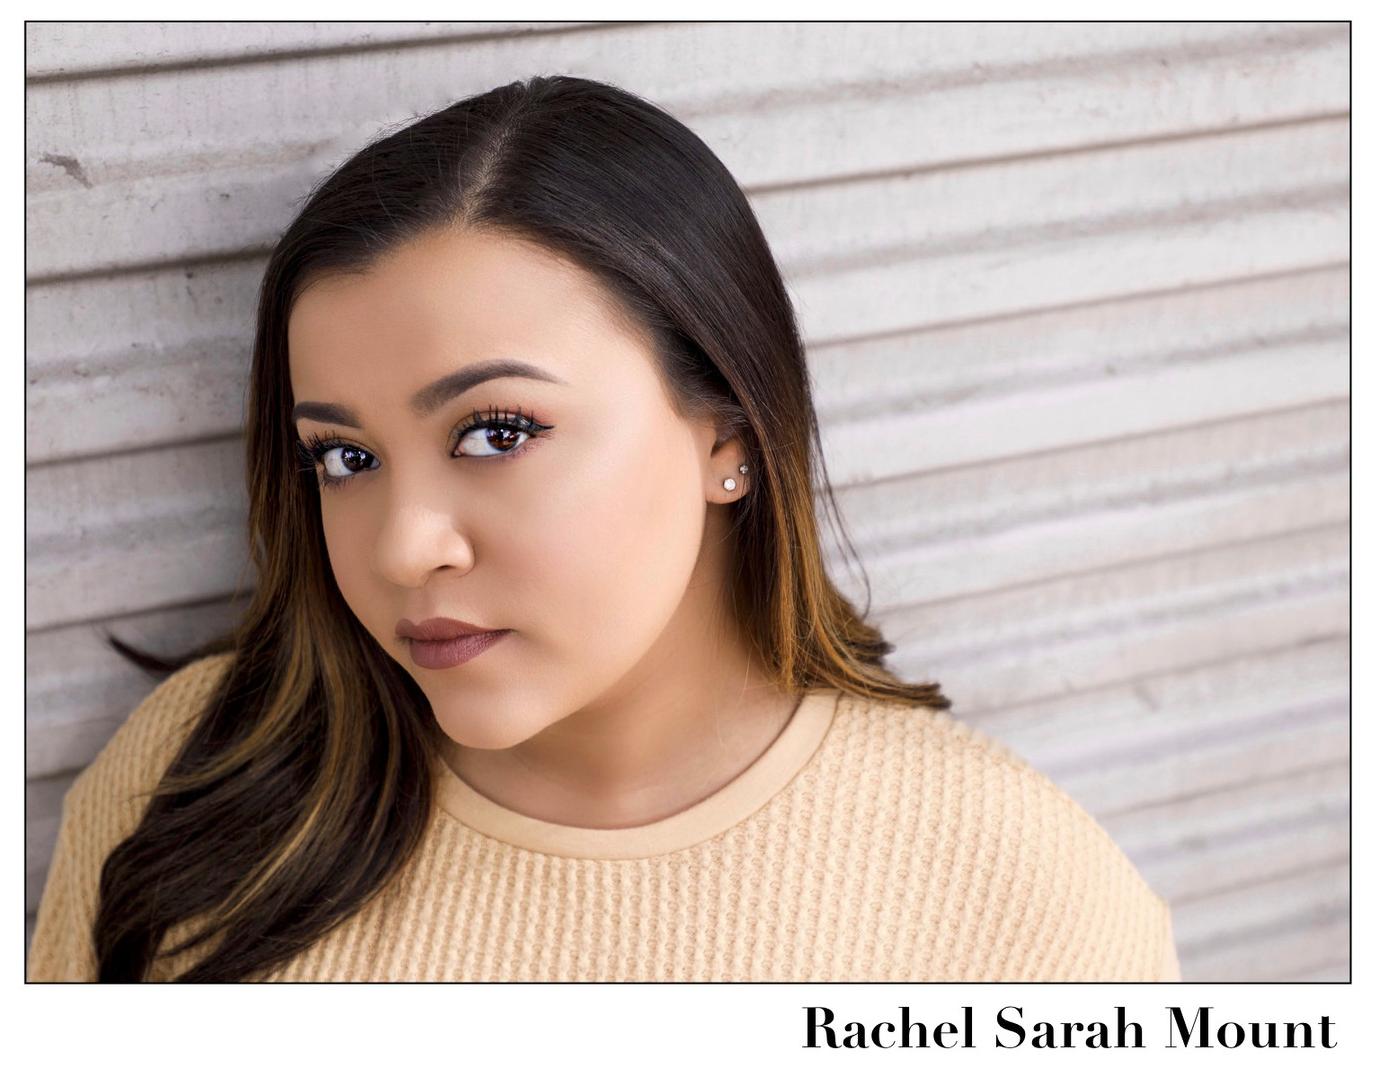 RACHEL SARAH MOUNT